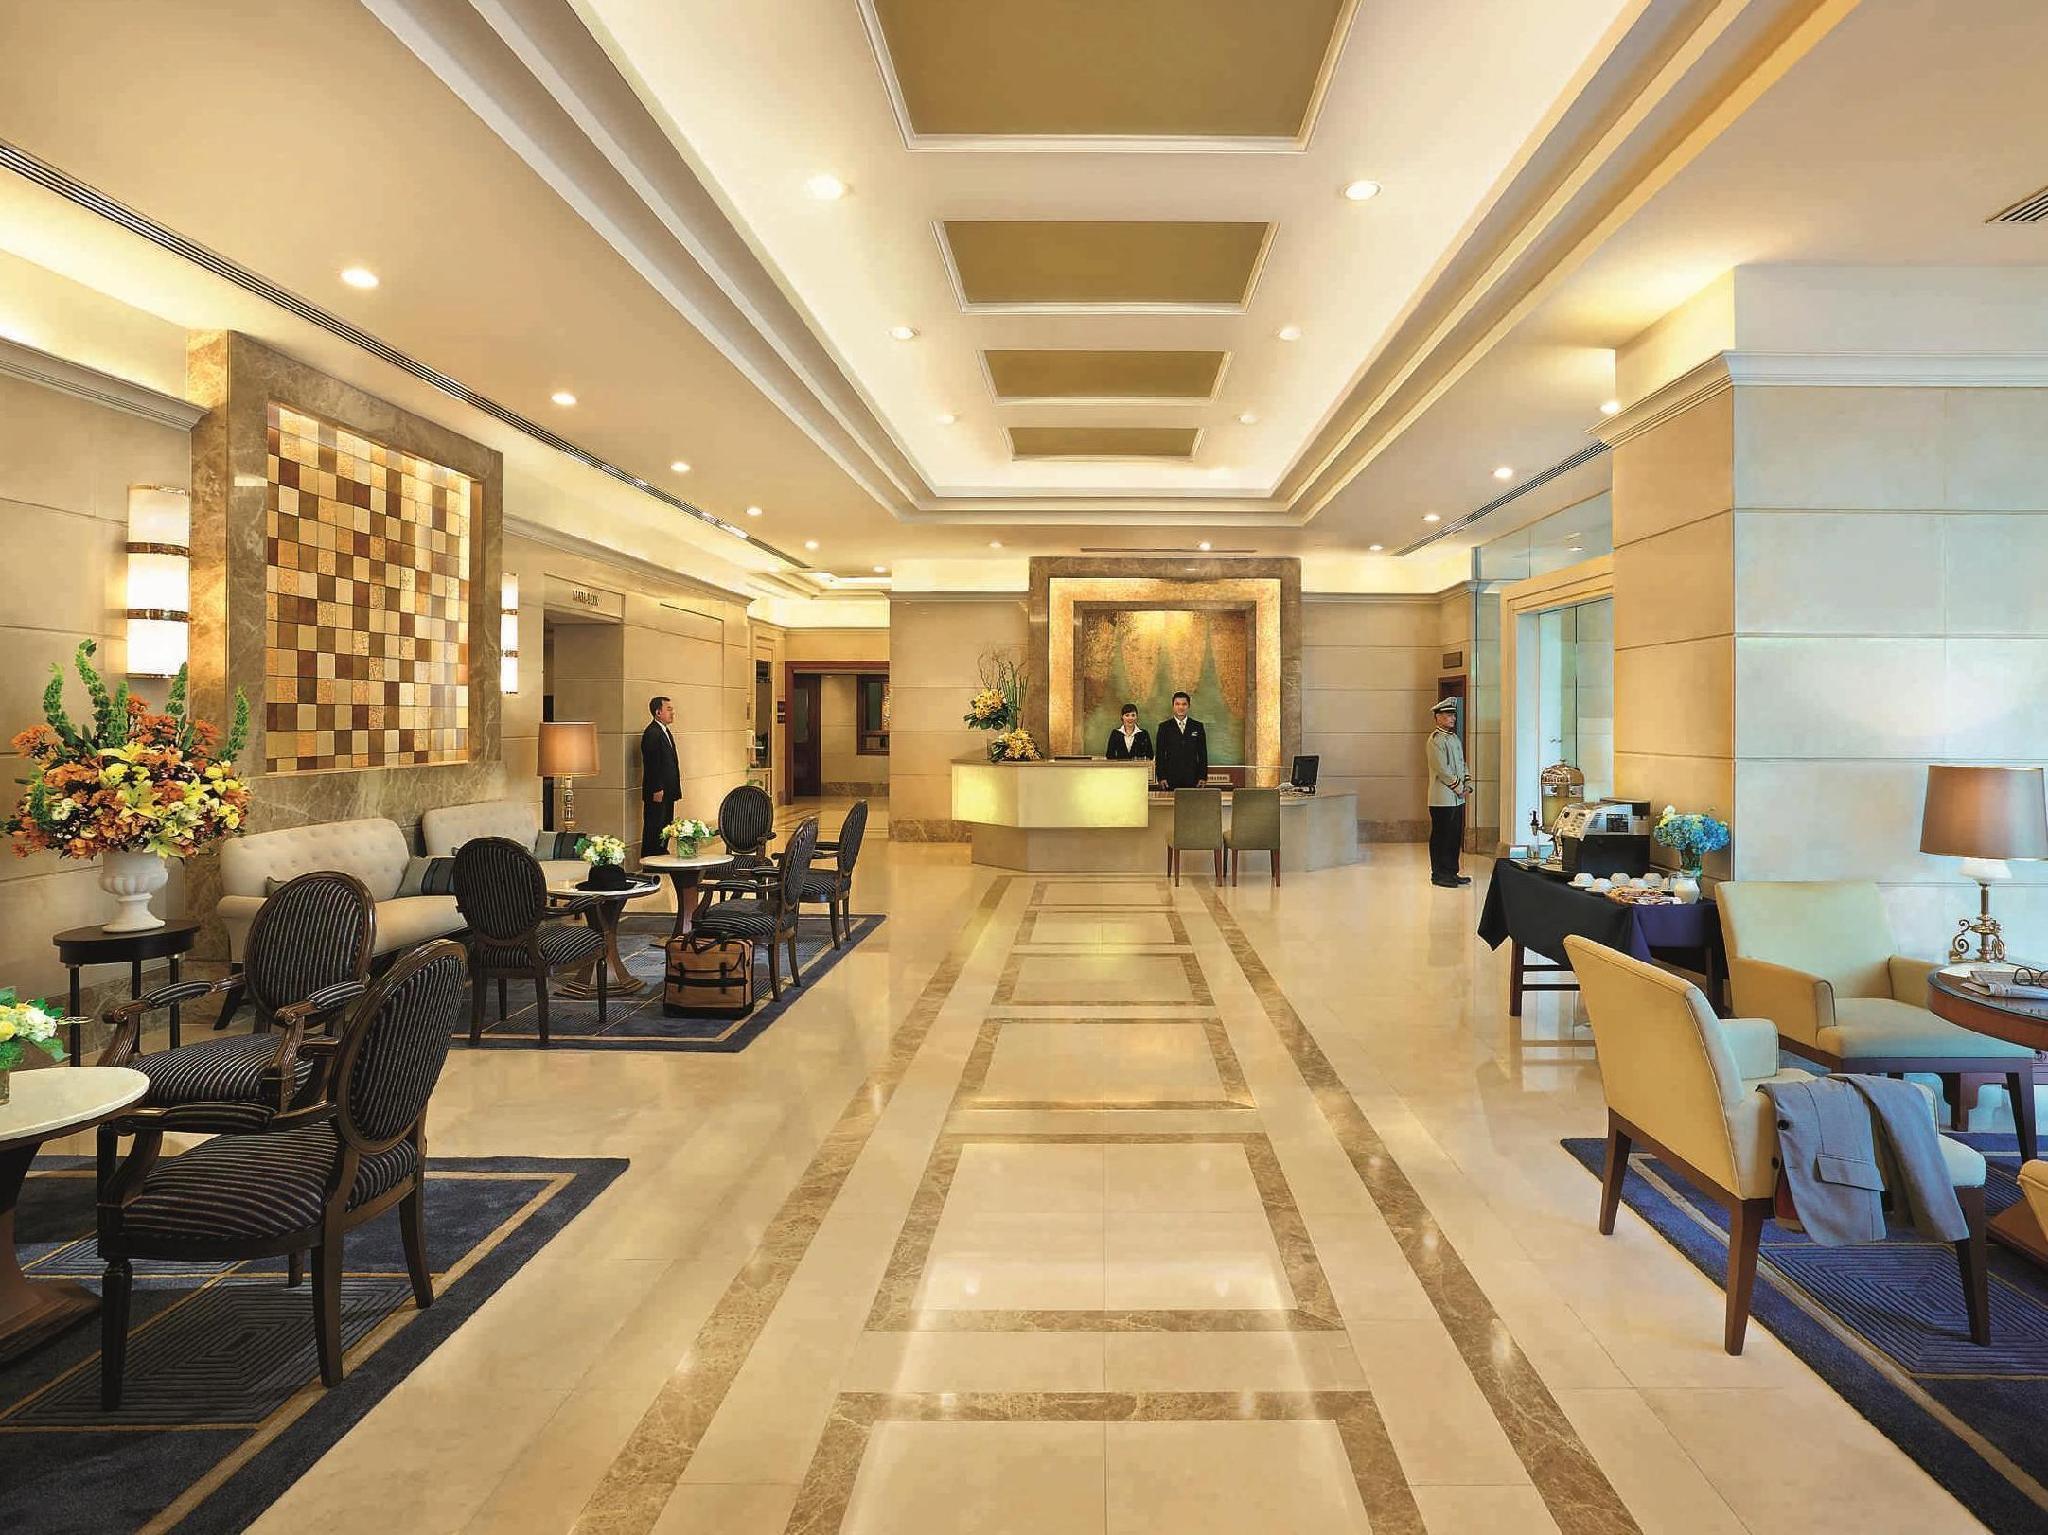 Centre Point Sukhumvit 10 Hotel โรงแรม เซนเตอร์ พอยต์ สุขุมวิท10